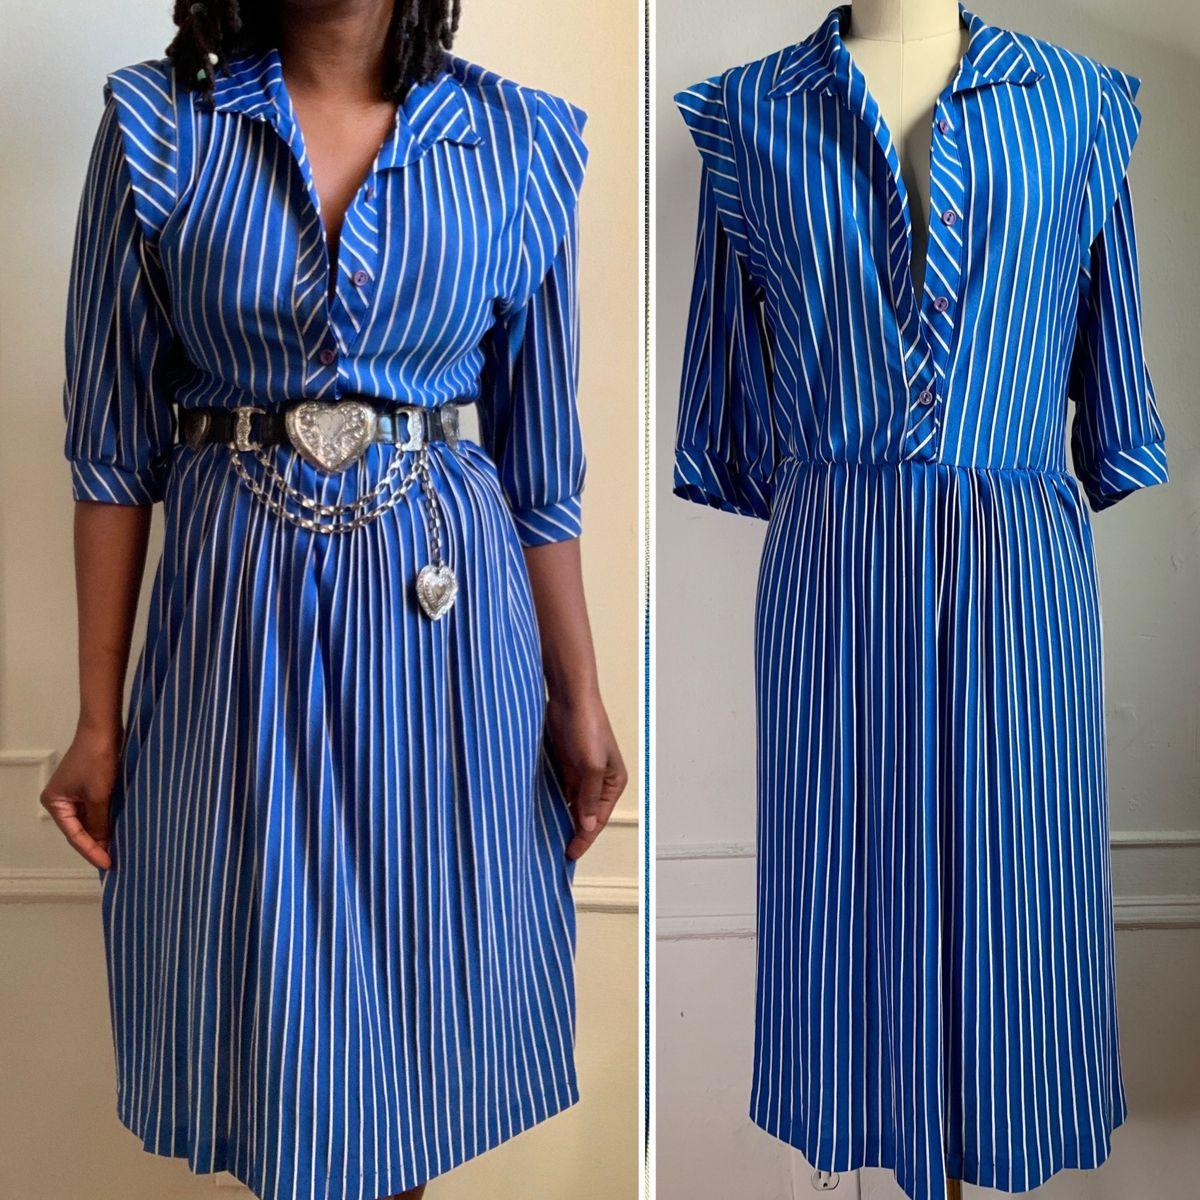 #dress #vintage #vintagestyle #thrifted #thriftedfashion